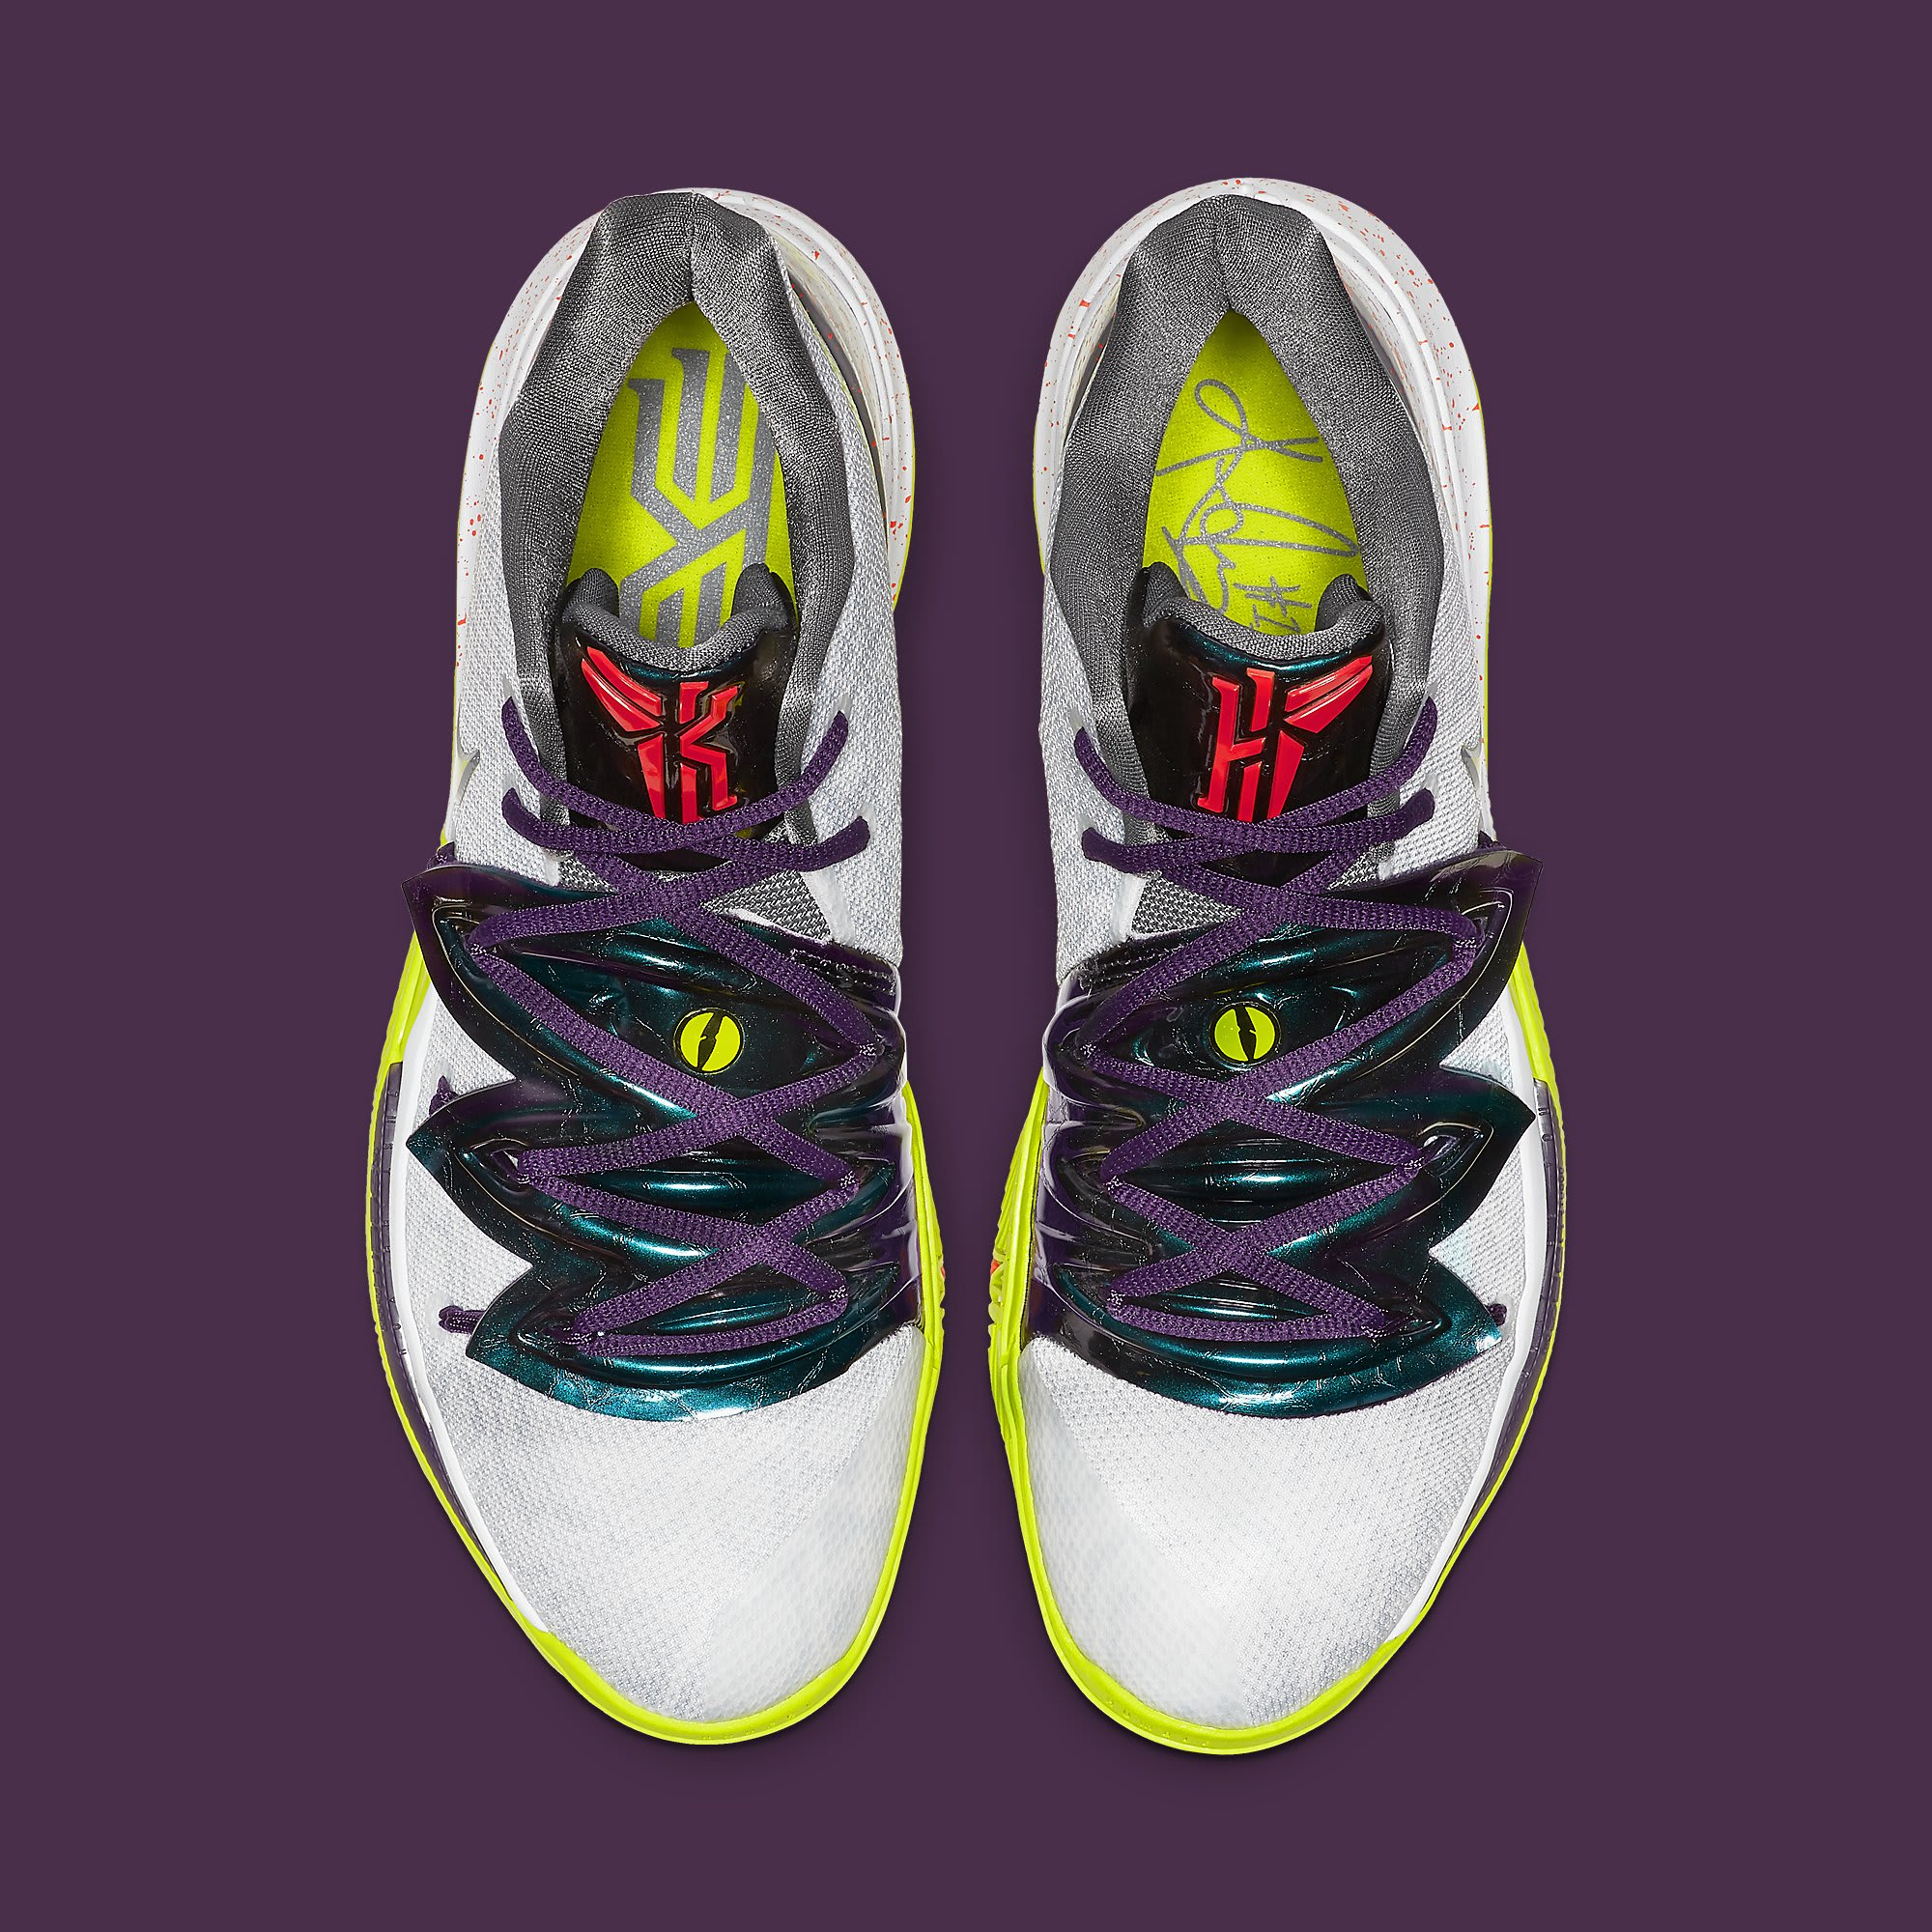 Nike Kyrie 5 Chaos Mamba Mentality Release Date AO2918-102 Top